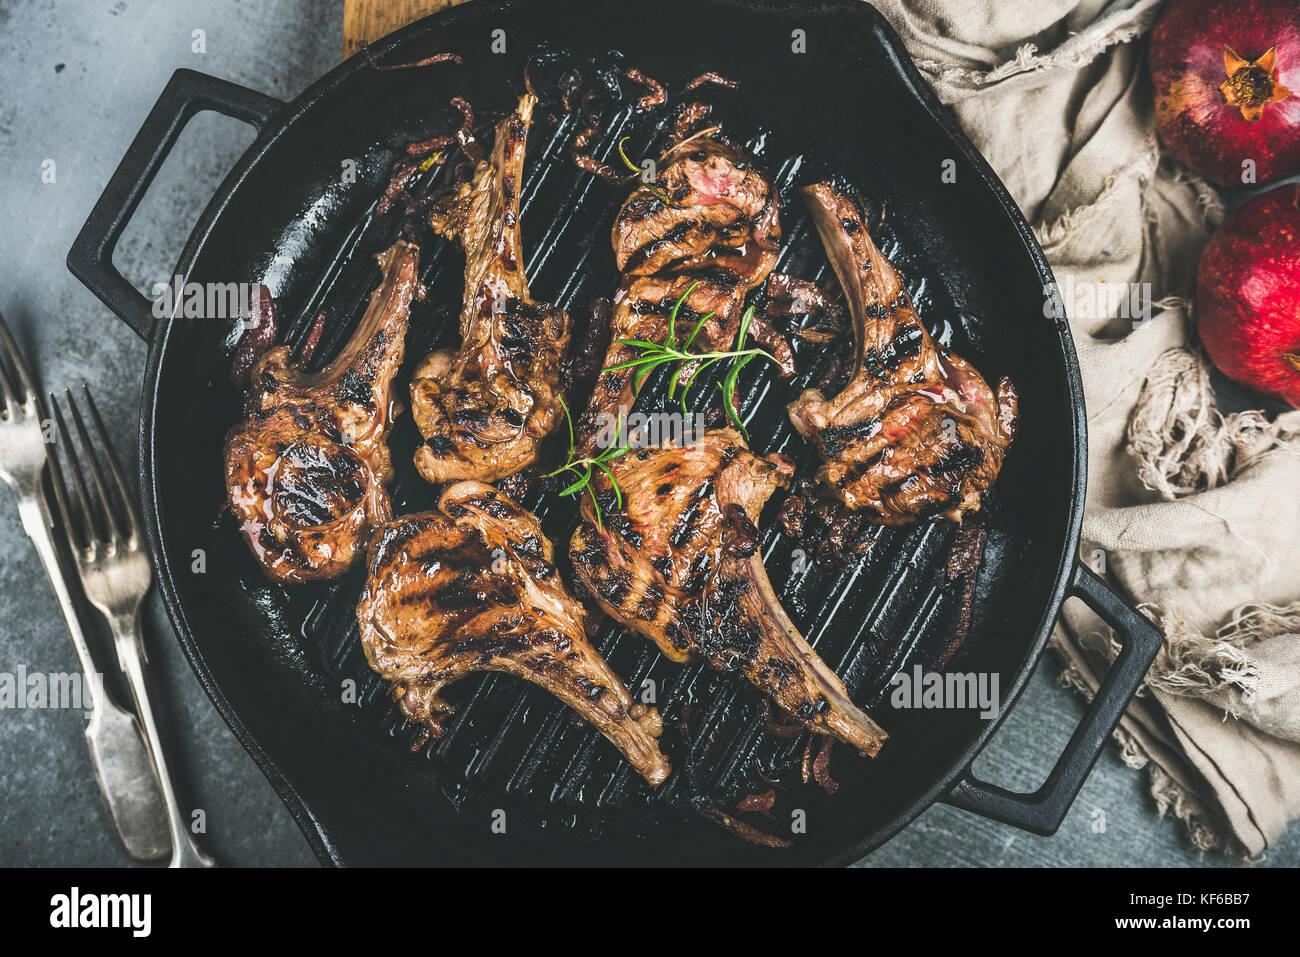 Cena de barbacoa con chuletas de cordero a la brasa en pan Imagen De Stock